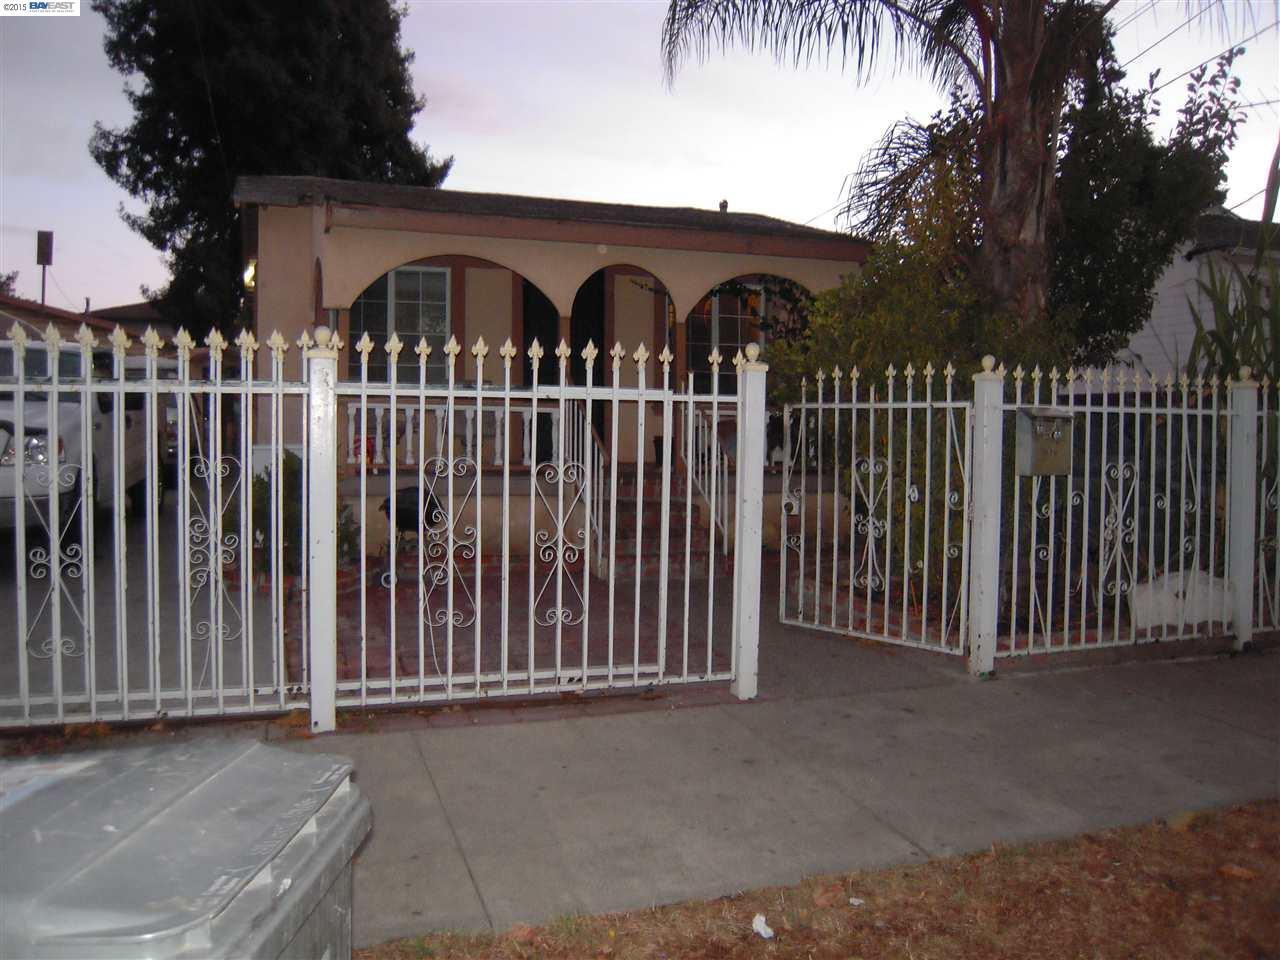 1634 100th Ave, Oakland, CA